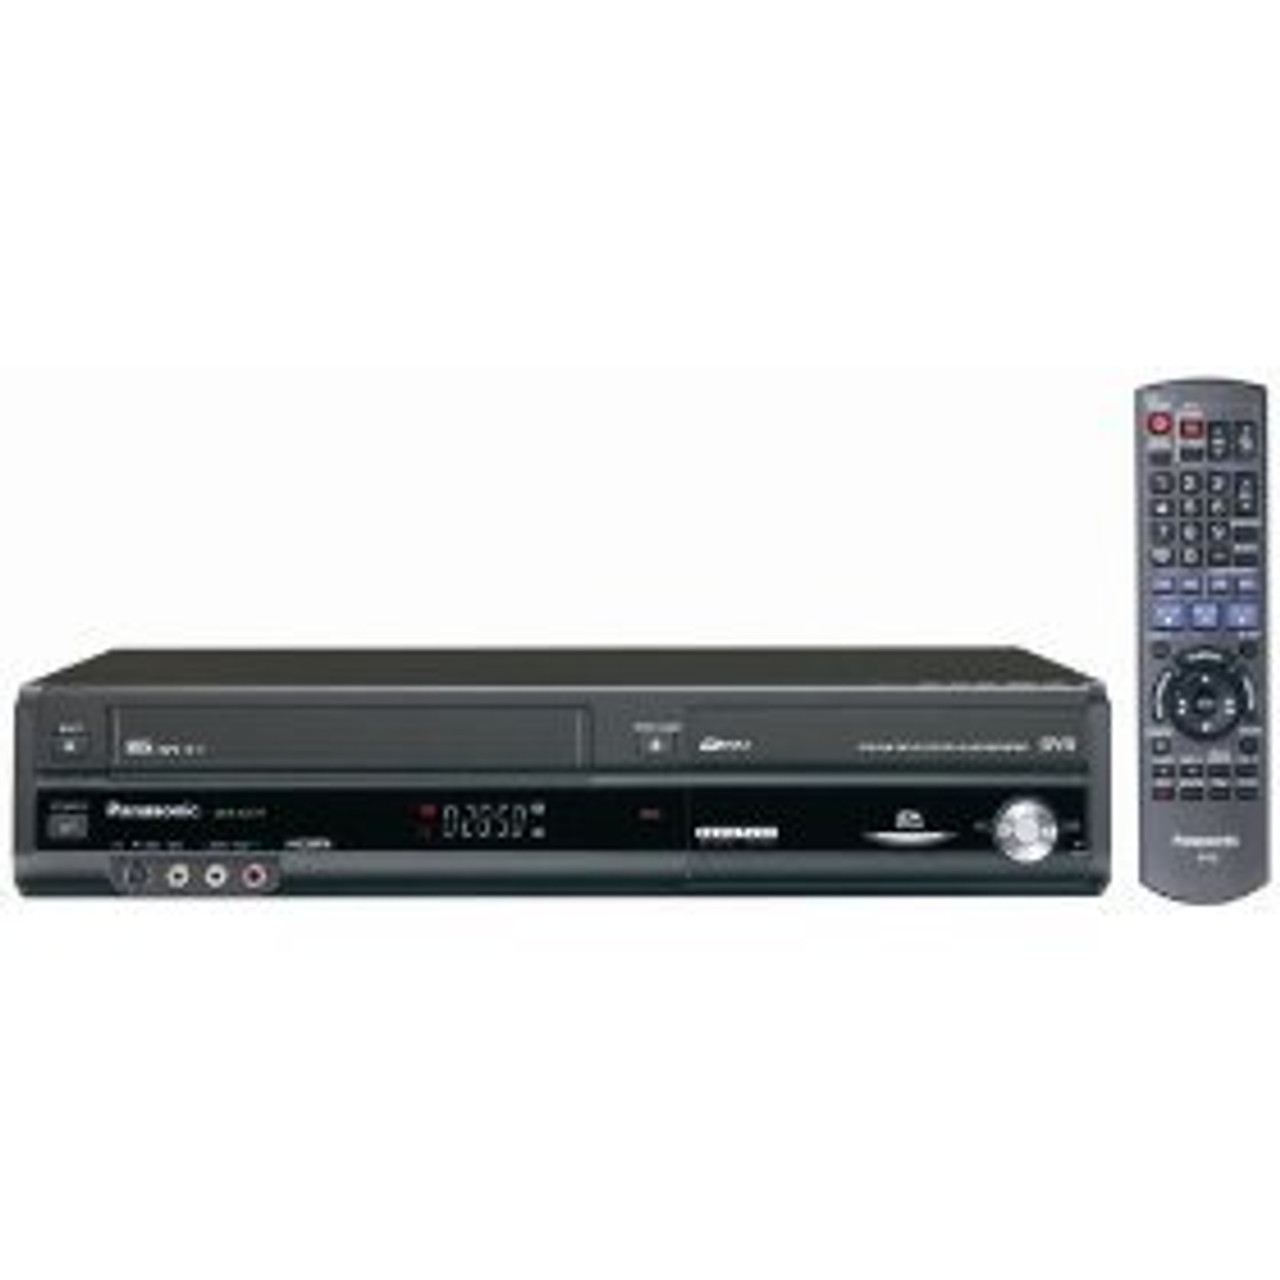 Panasonic DMR-EZ48V DVD-Recorder/VCR Combo digital dvd vhs combo